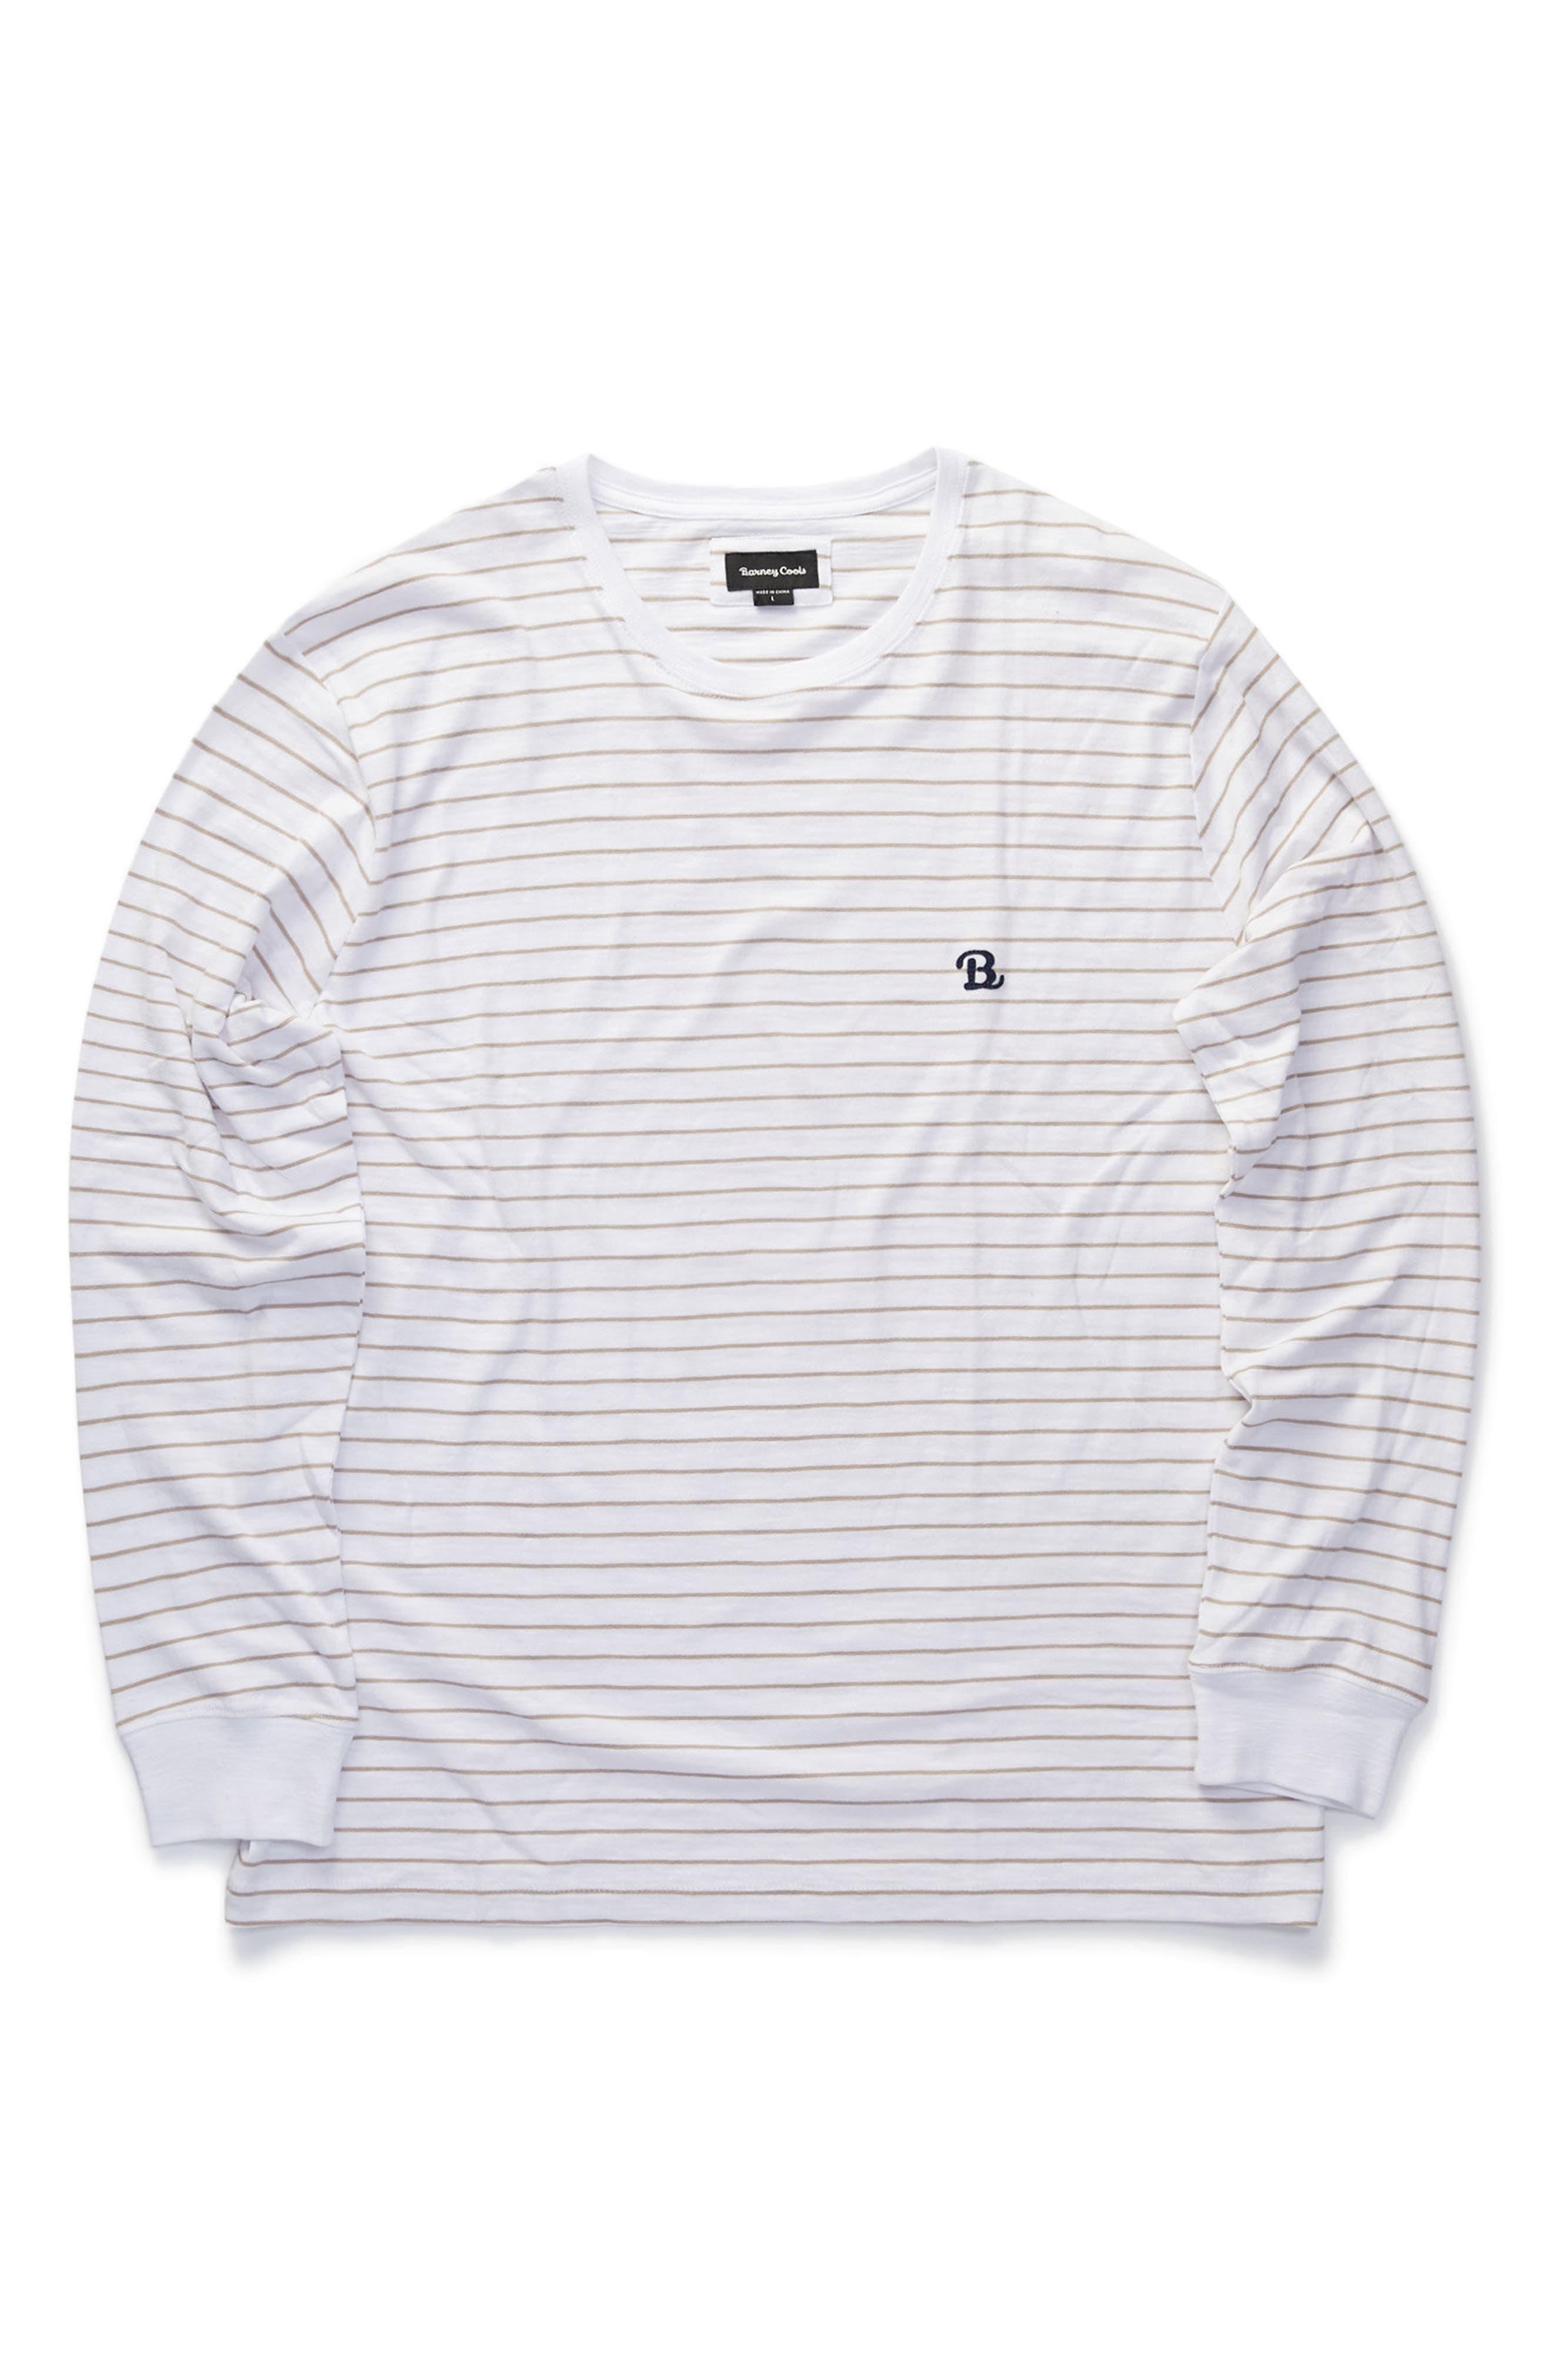 B. Schooled T-Shirt,                             Alternate thumbnail 5, color,                             Beige Stripe